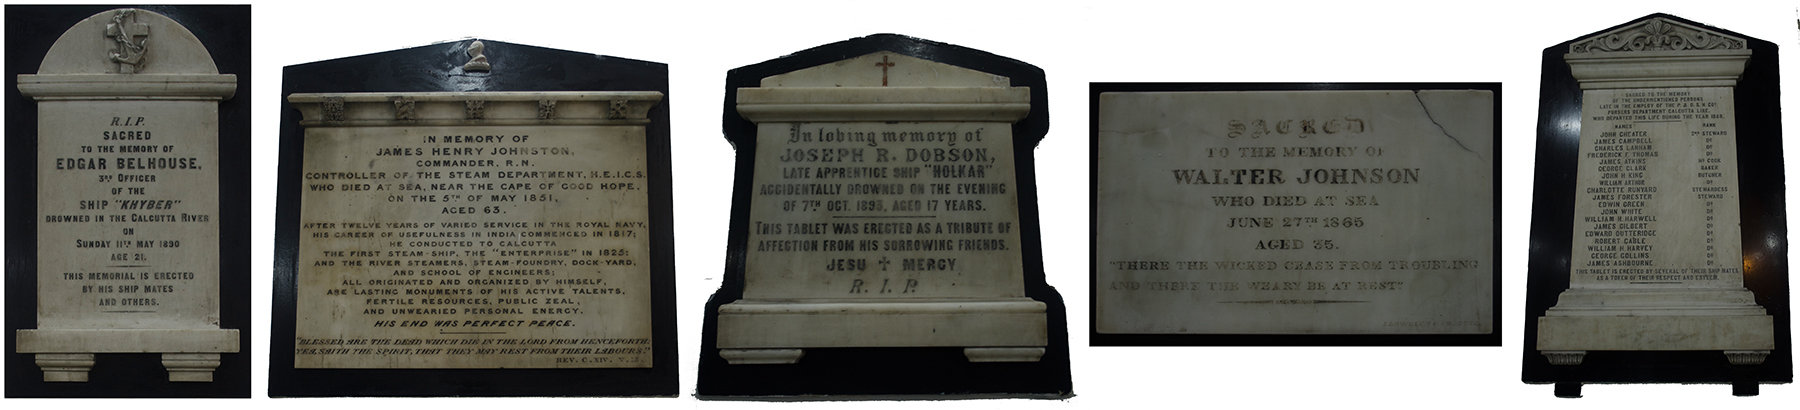 Memorial Plaques of seamen, St. Stephen's Church, Kidderpore, Kolkata (click to enlarge)